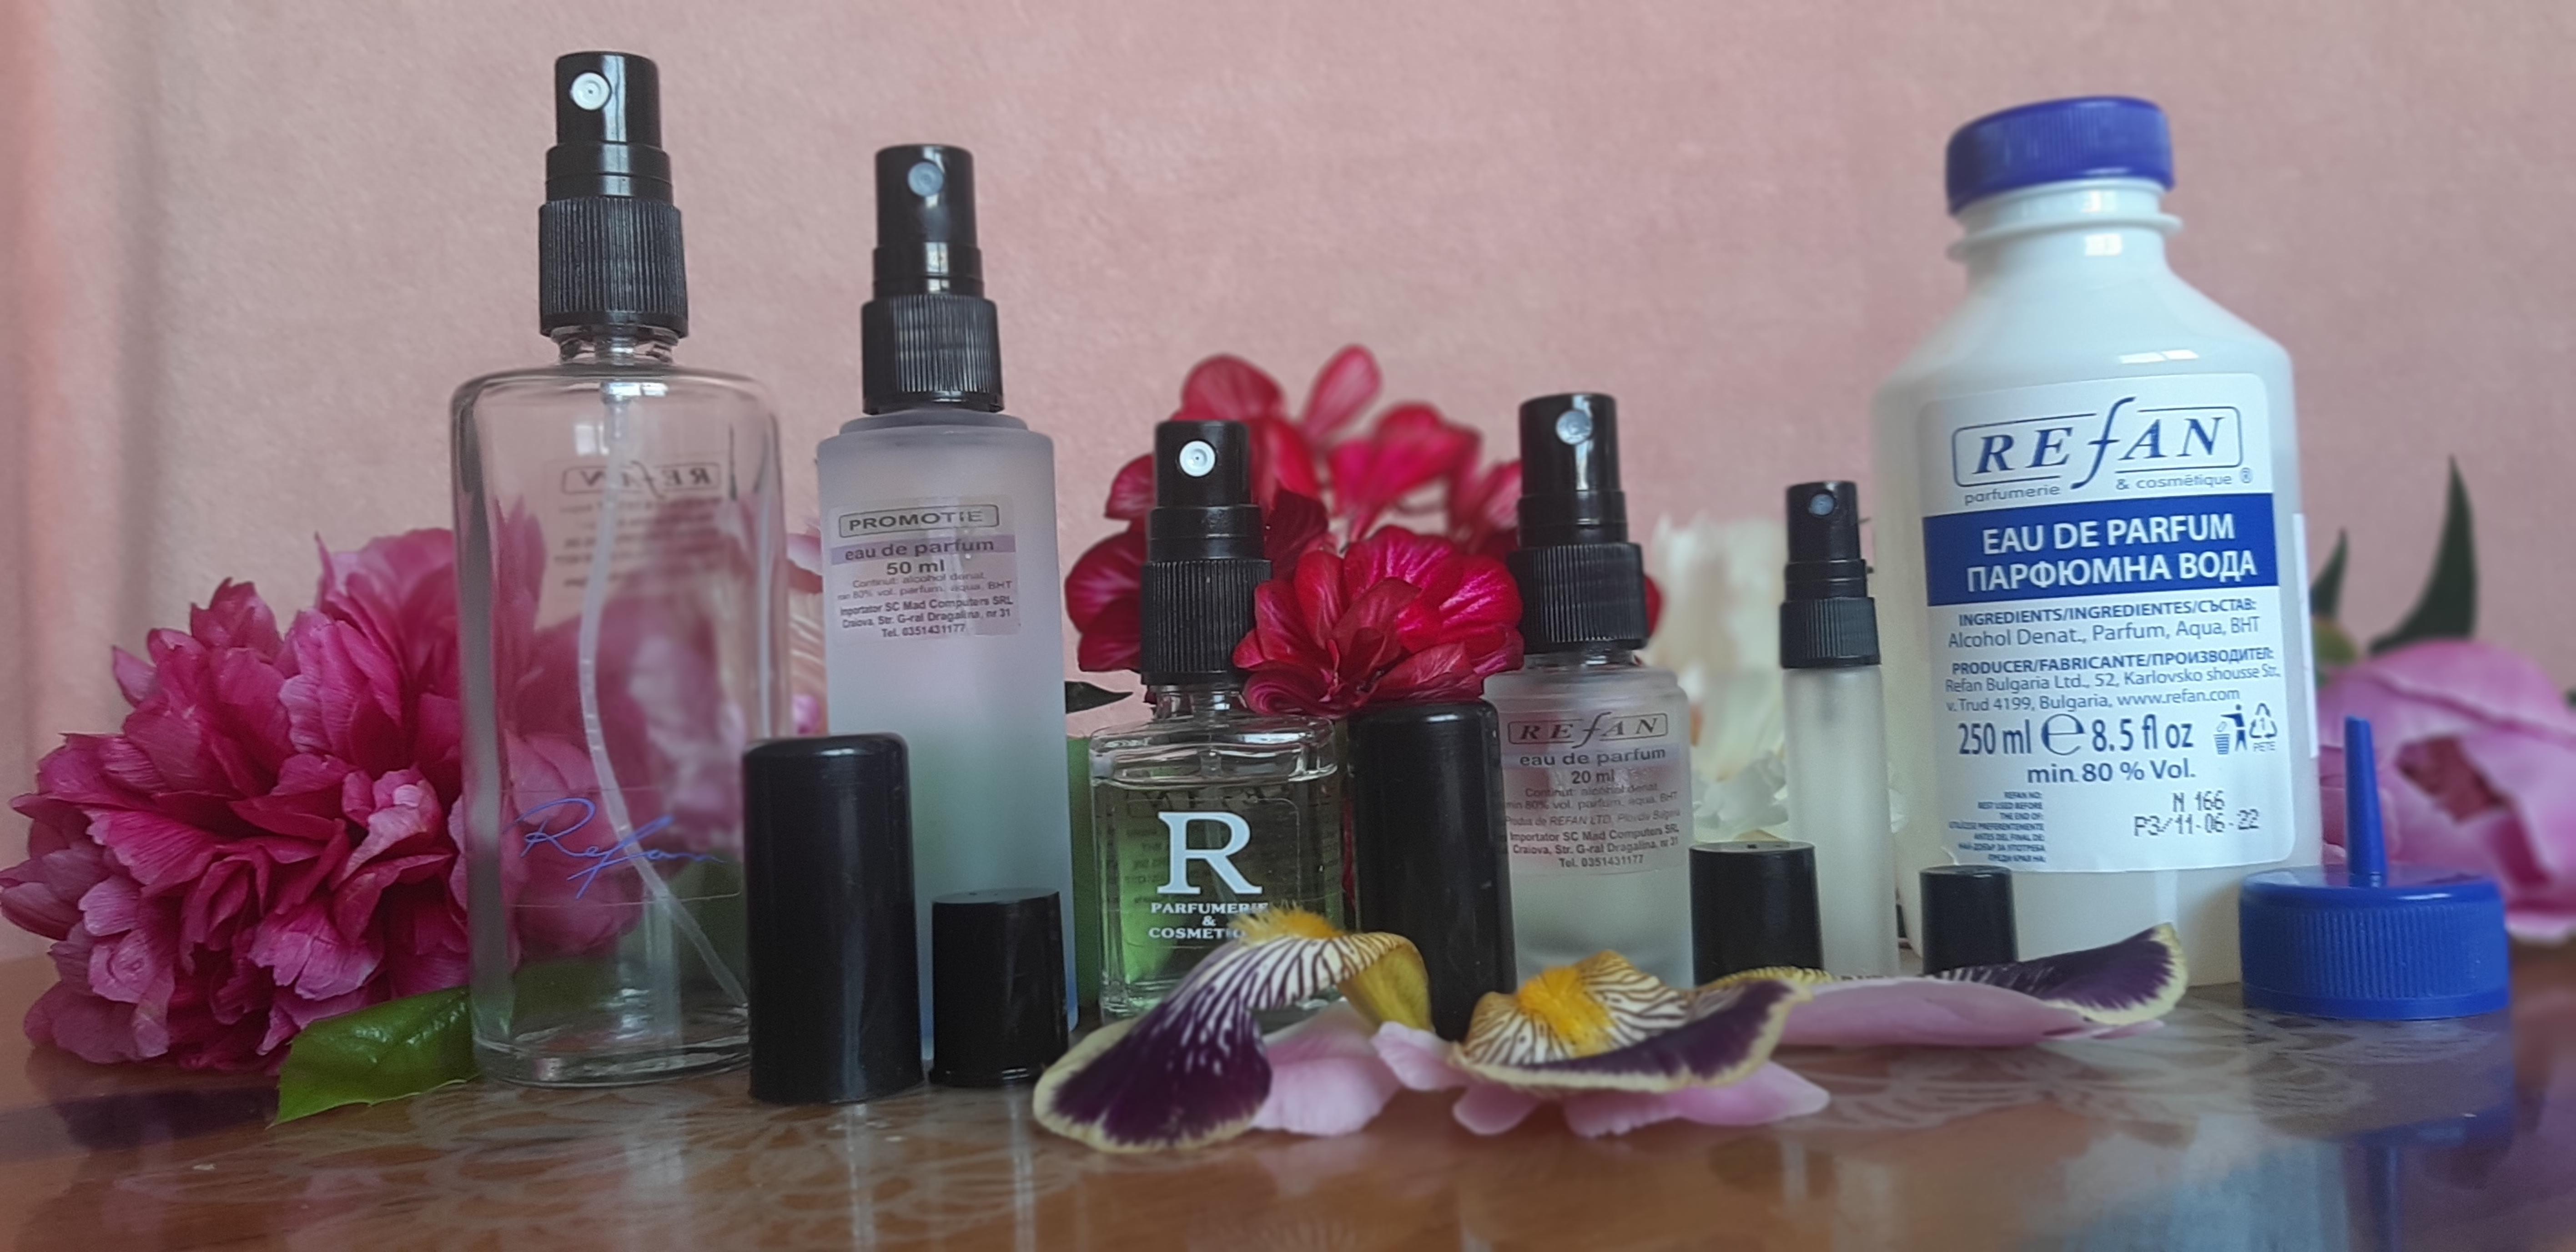 https://0201.nccdn.net/1_2/000/000/09a/934/REFAN-Romania-parfumuri-mai-2020.jpg